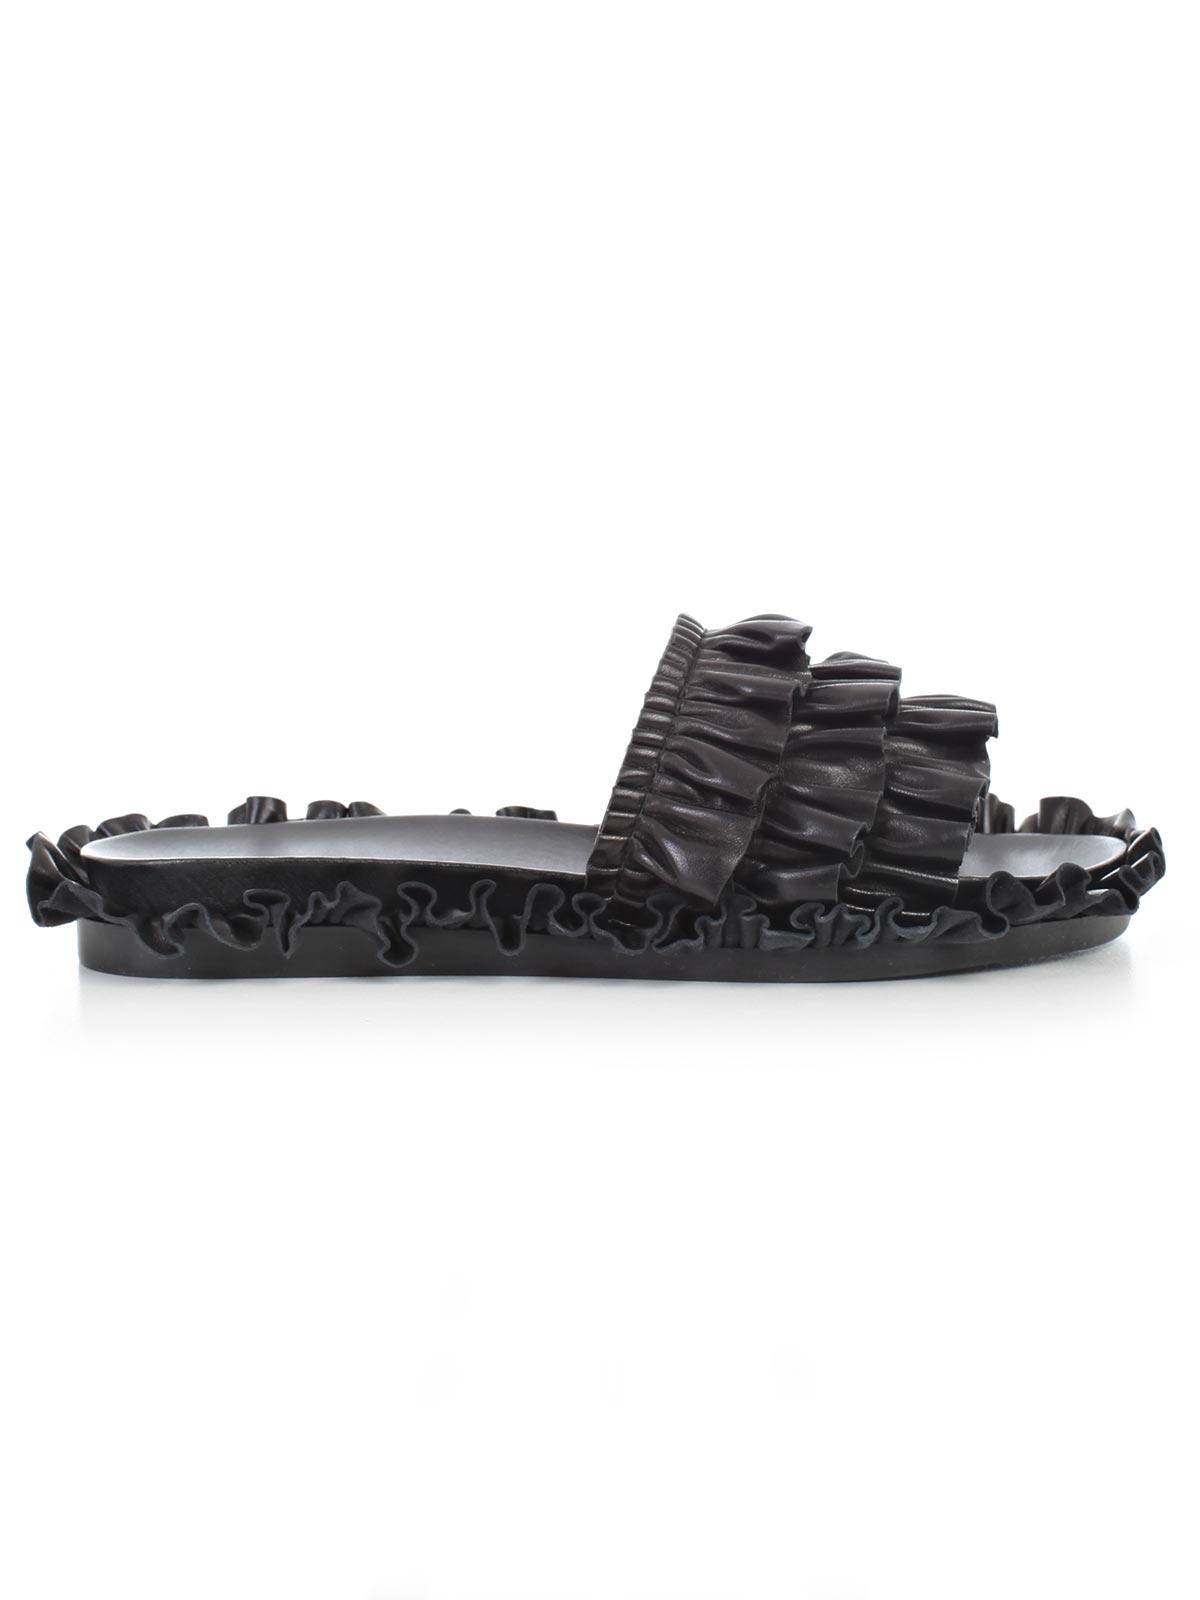 Picture of SIMONE ROCHA Footwear